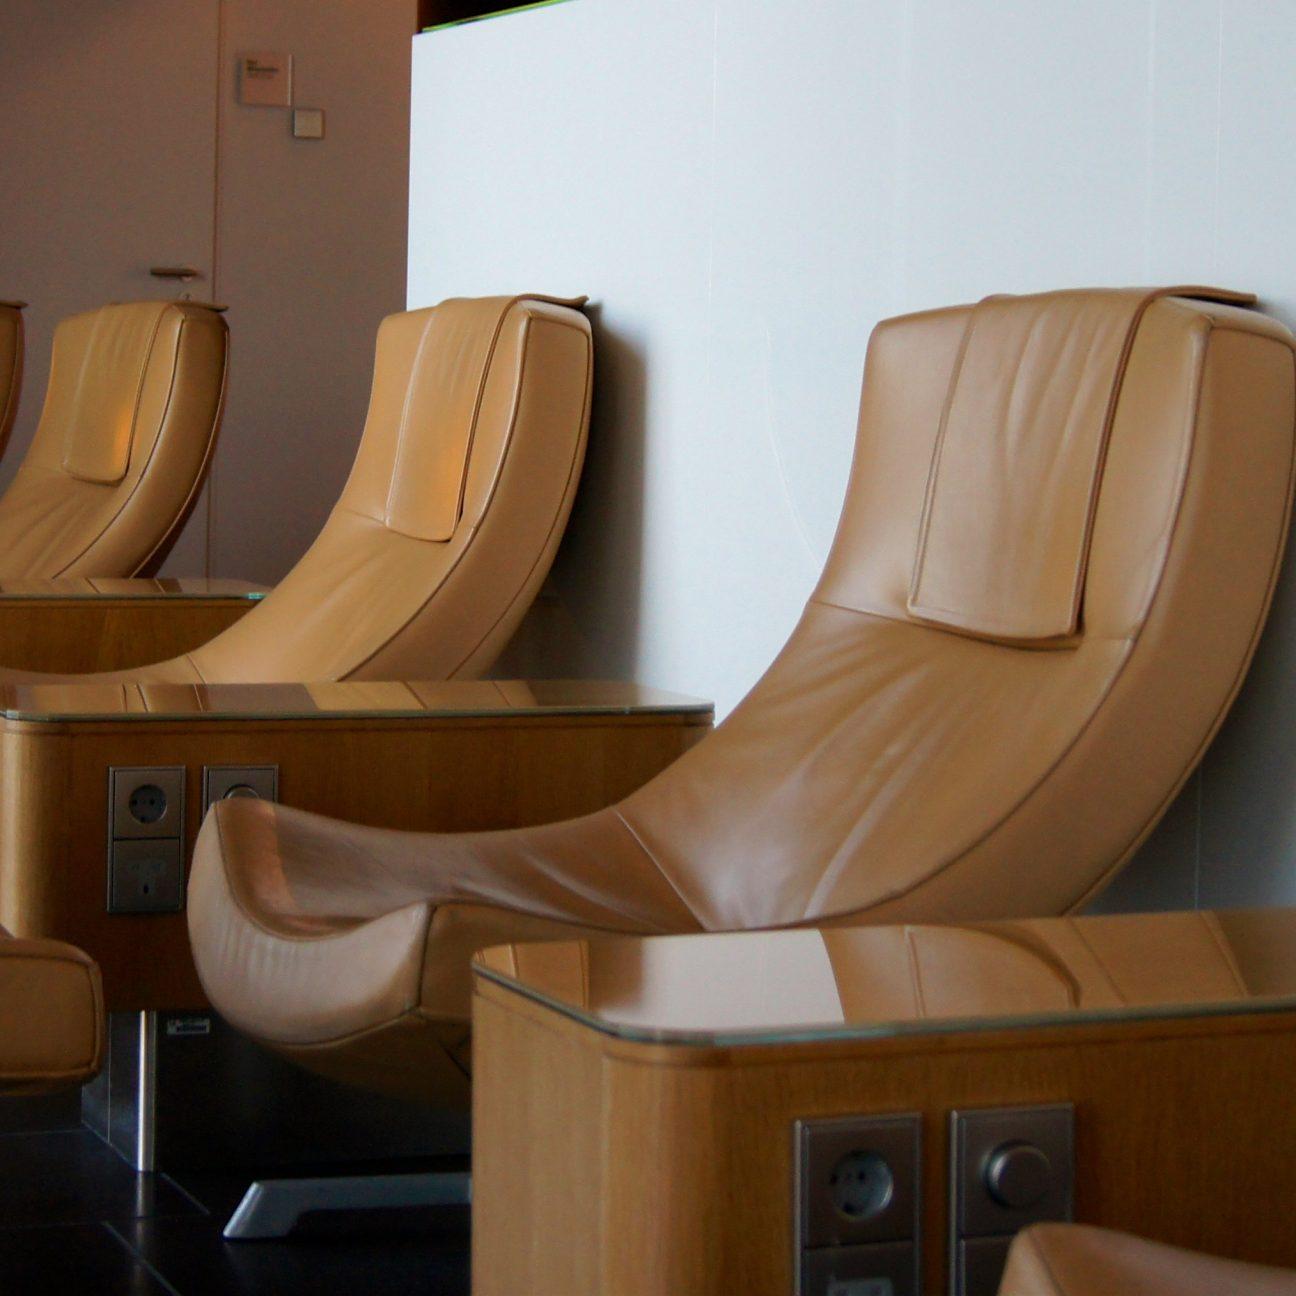 Row of plush seats